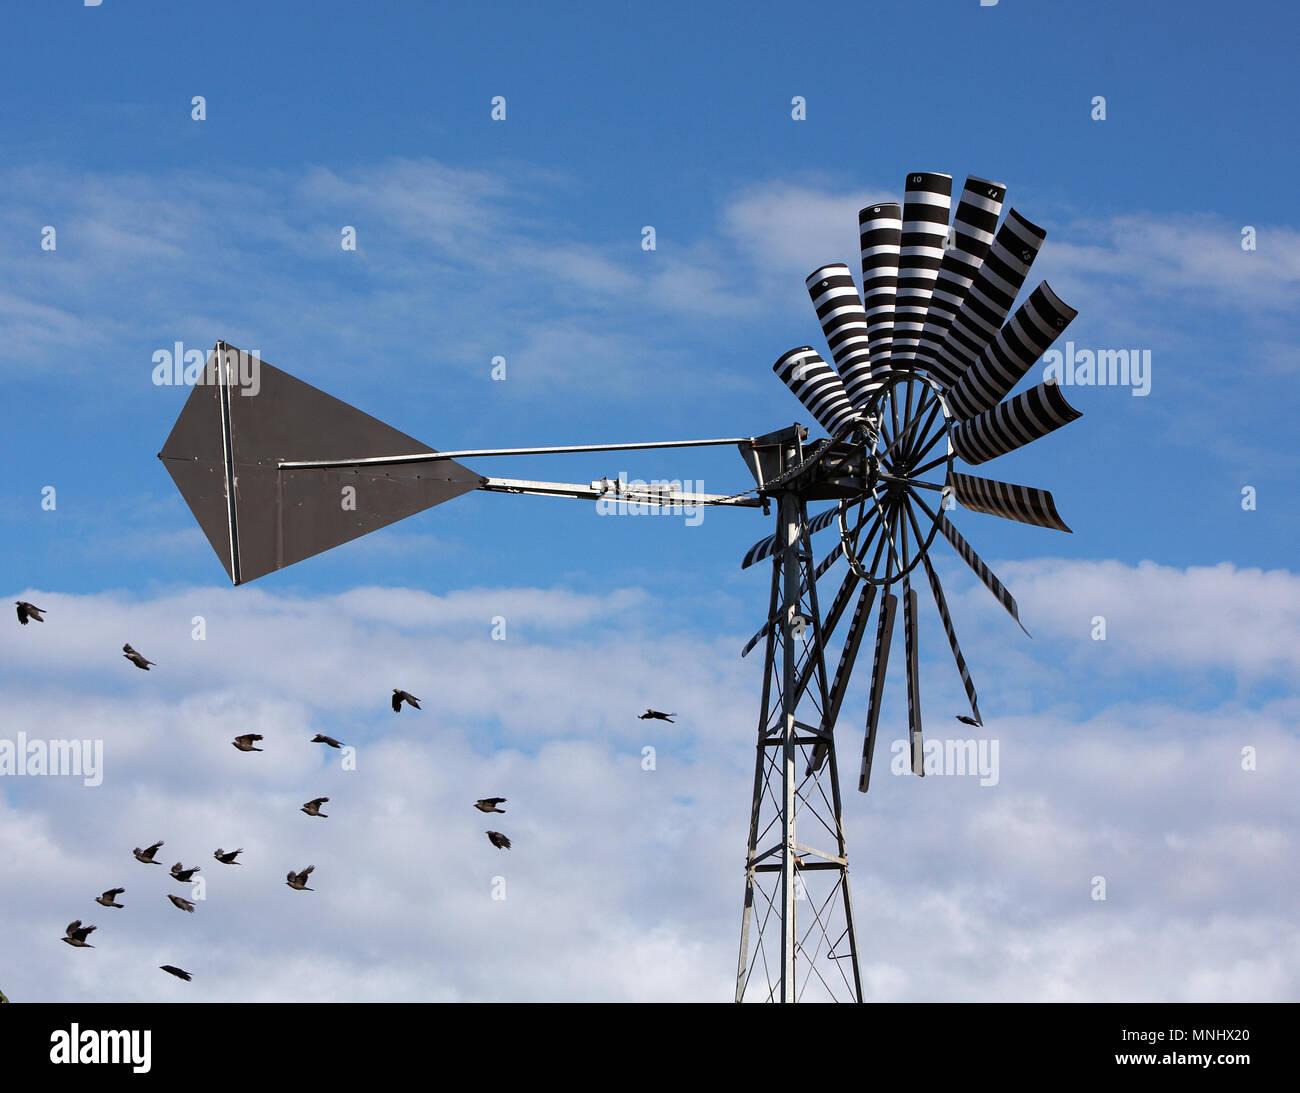 A multi-bladed windpump blue sky and clound with birds. - Stock Image